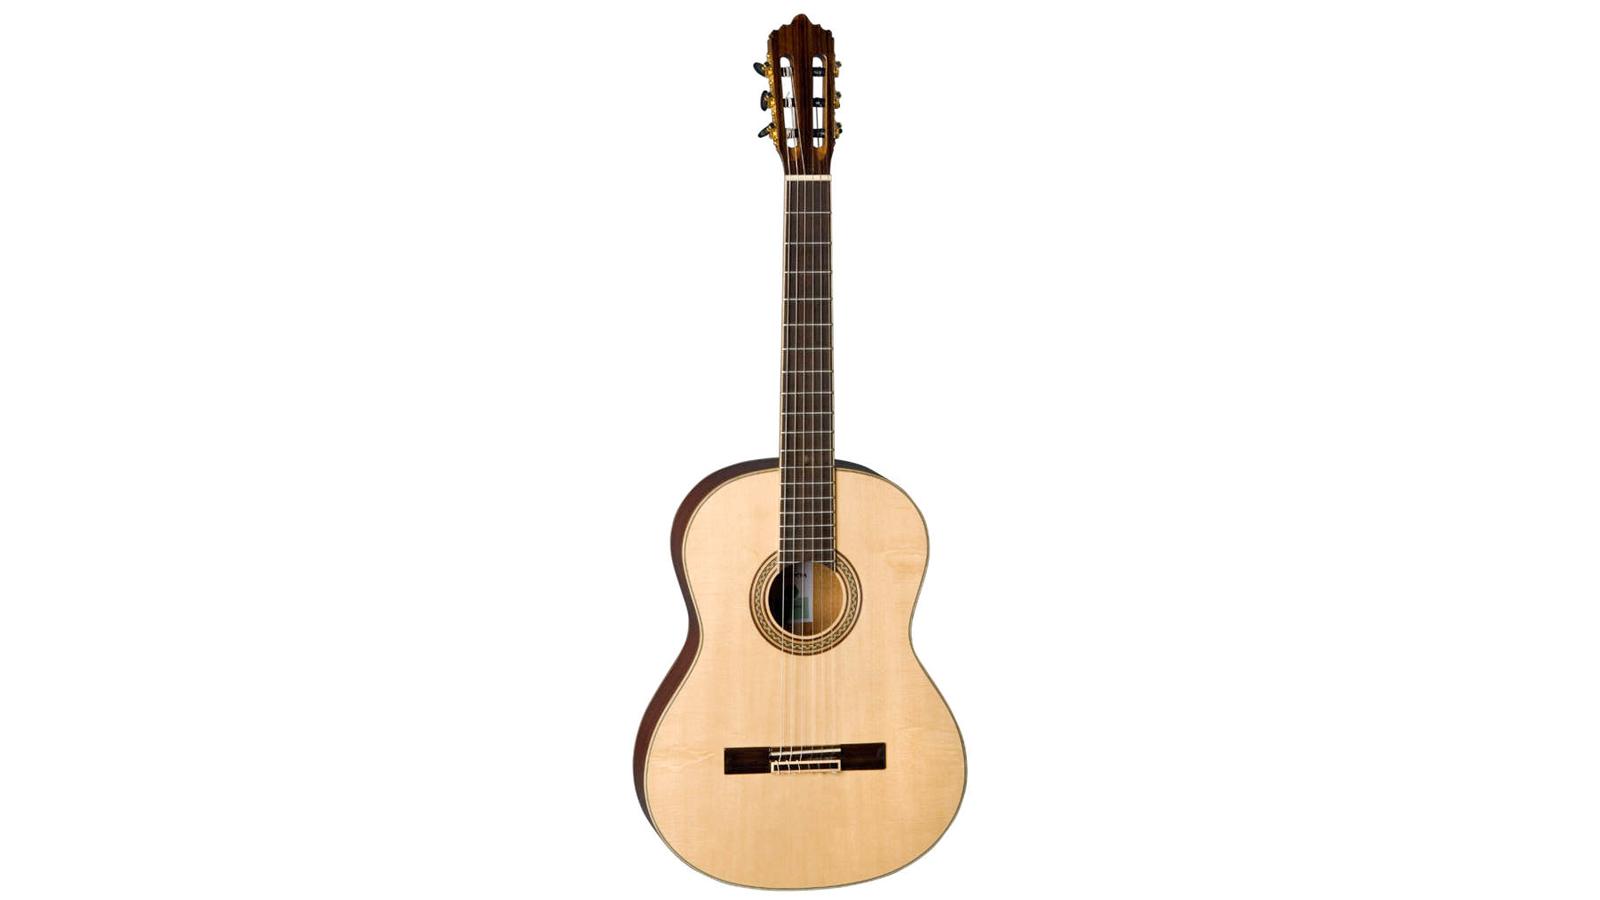 La Mancha Esmeralda Konzertgitarre 4/4